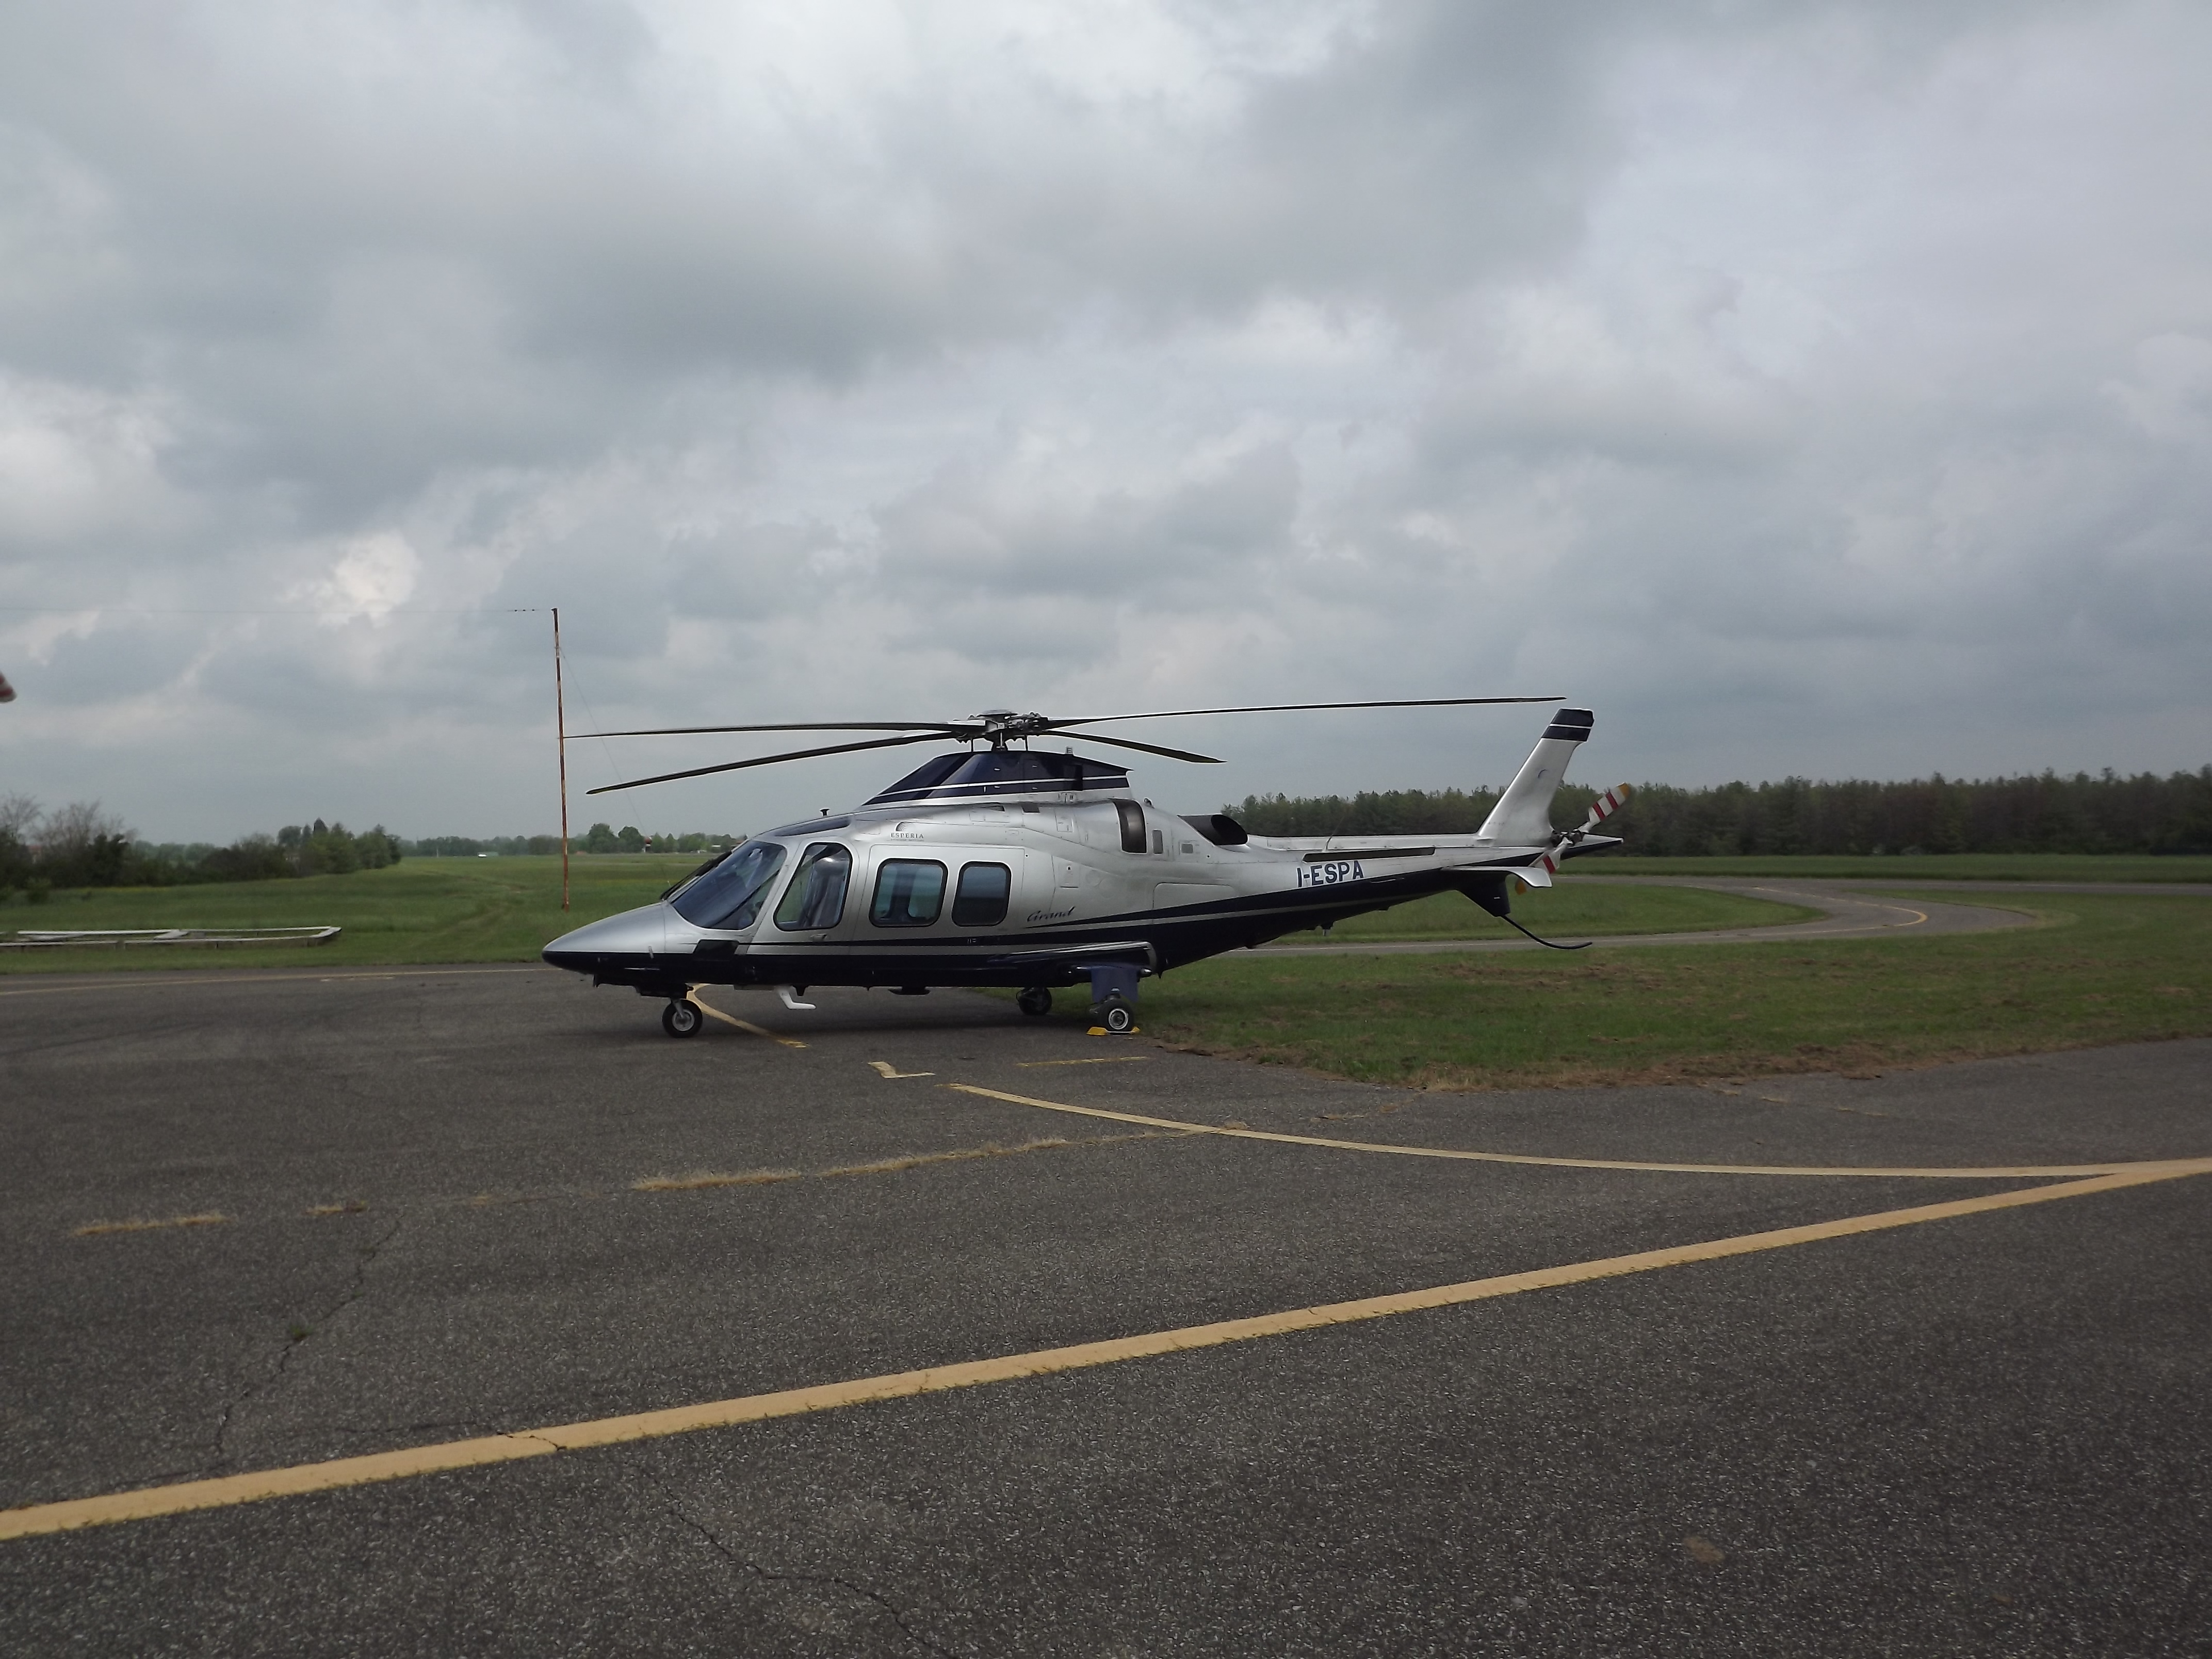 Elicottero Milano : Agusta westland aw 109s grand esperia aviation services u2013 aeroclub